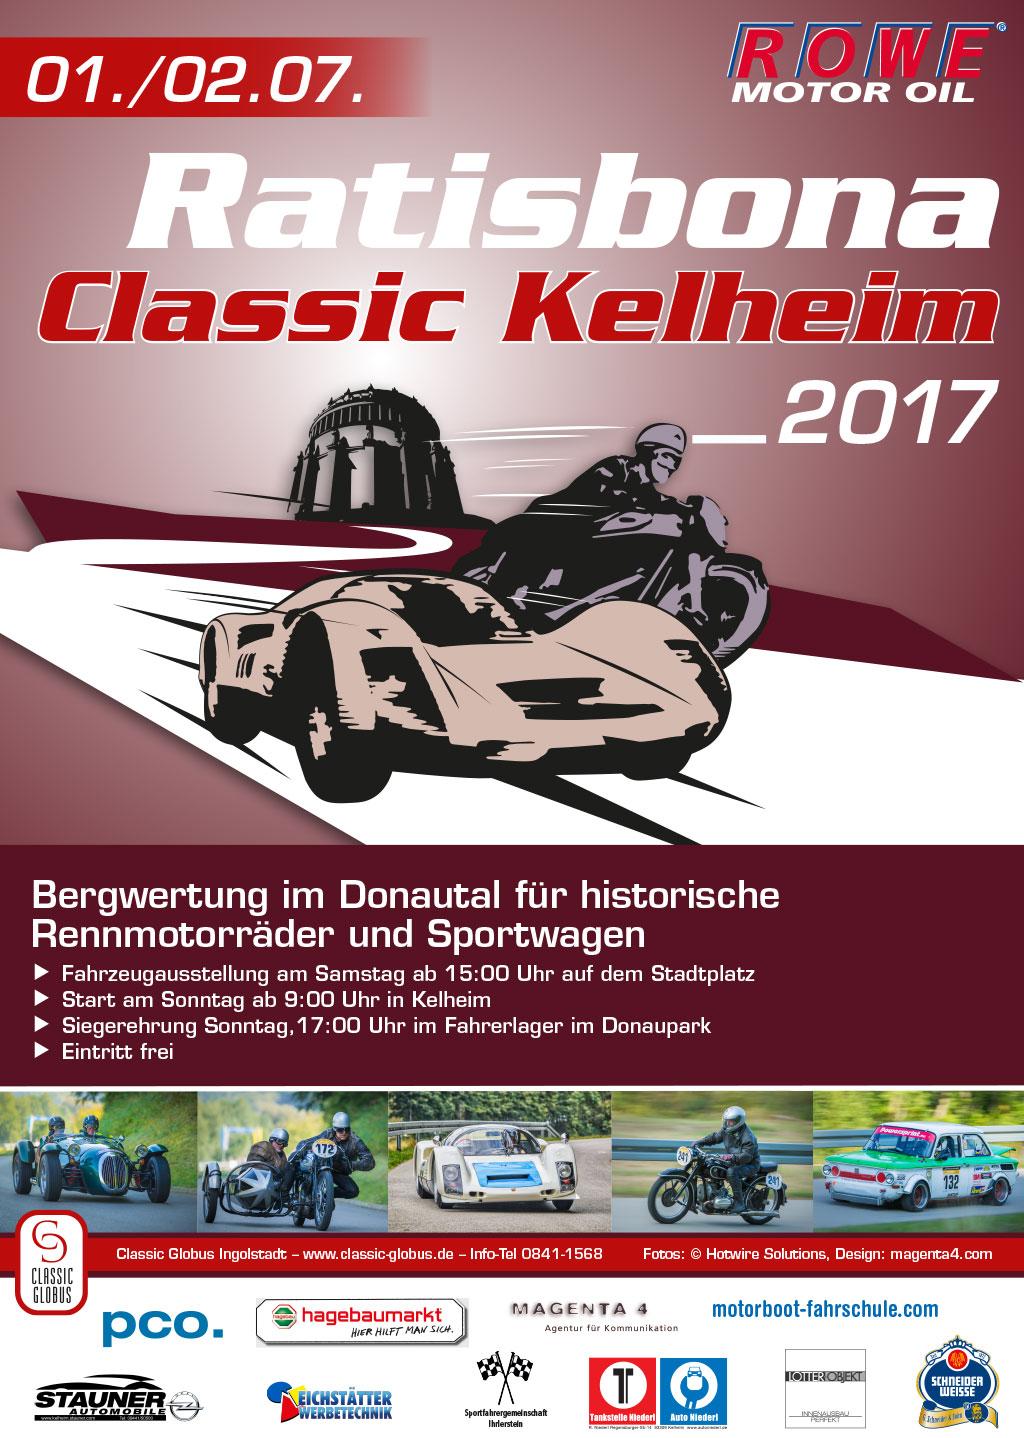 zurück zur Ratisbona Classic Kelheim 2017